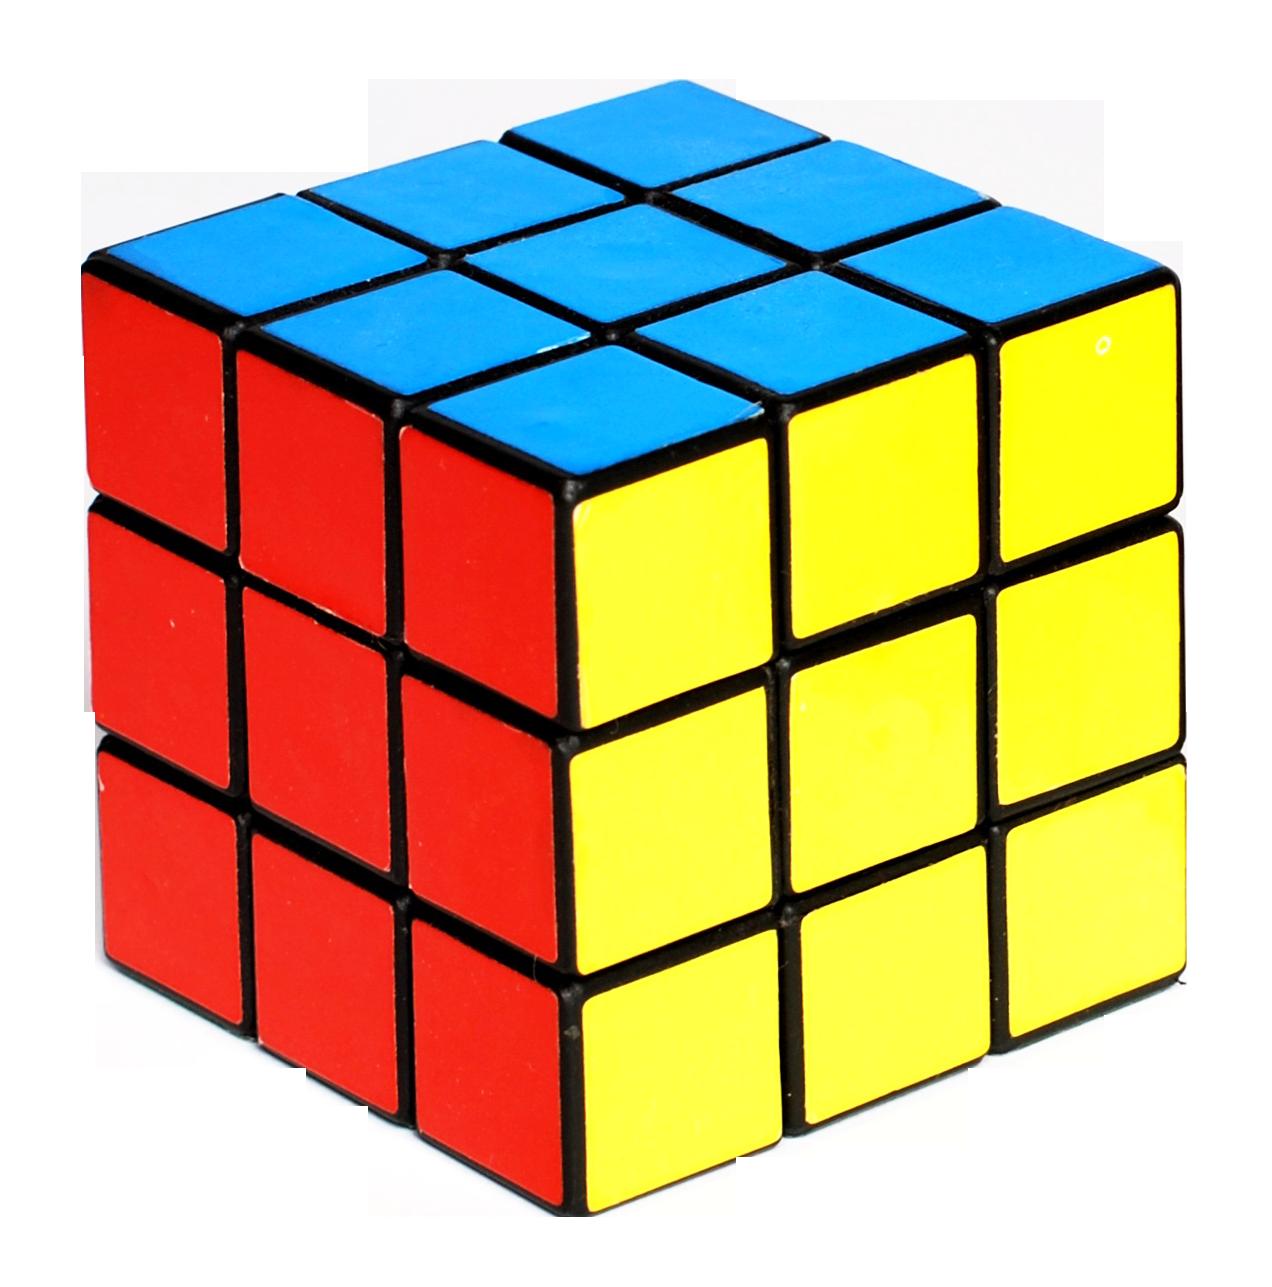 Rubik s cube png. Clipart toys transparent background